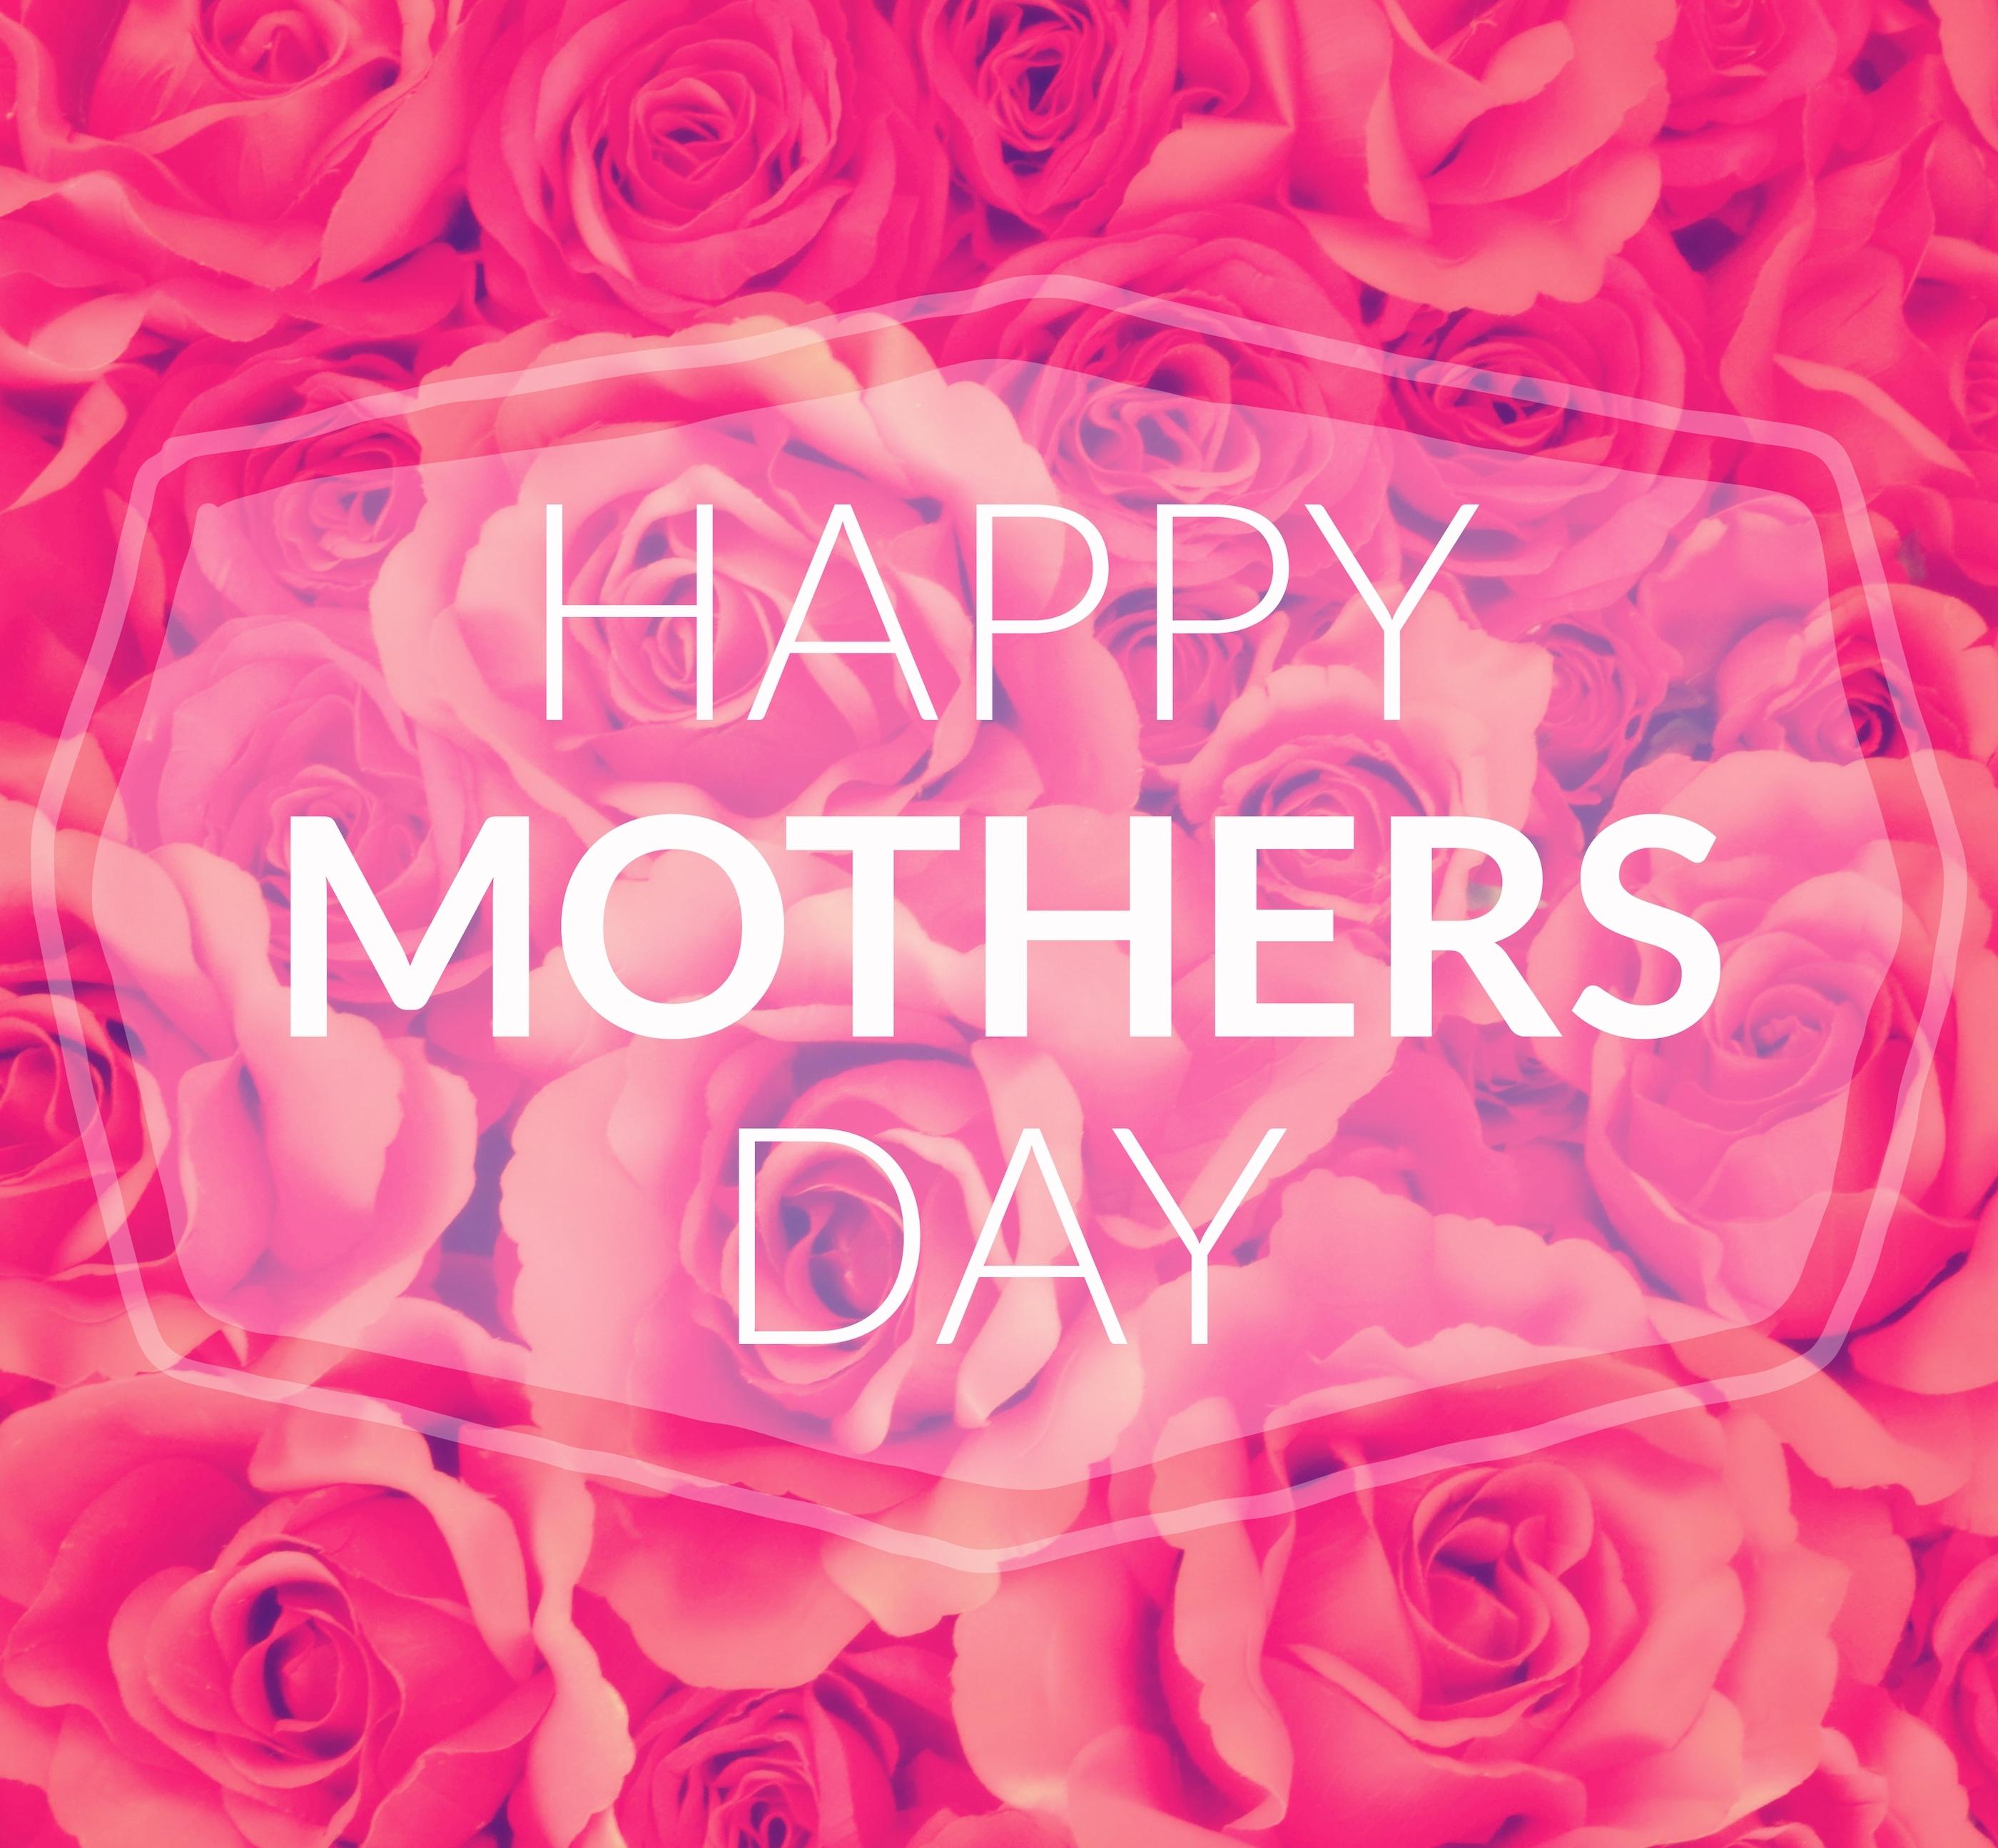 20931985b4f02d9008e0_c18b5d5769b56d8423b7_Mother_s_Day.jpg